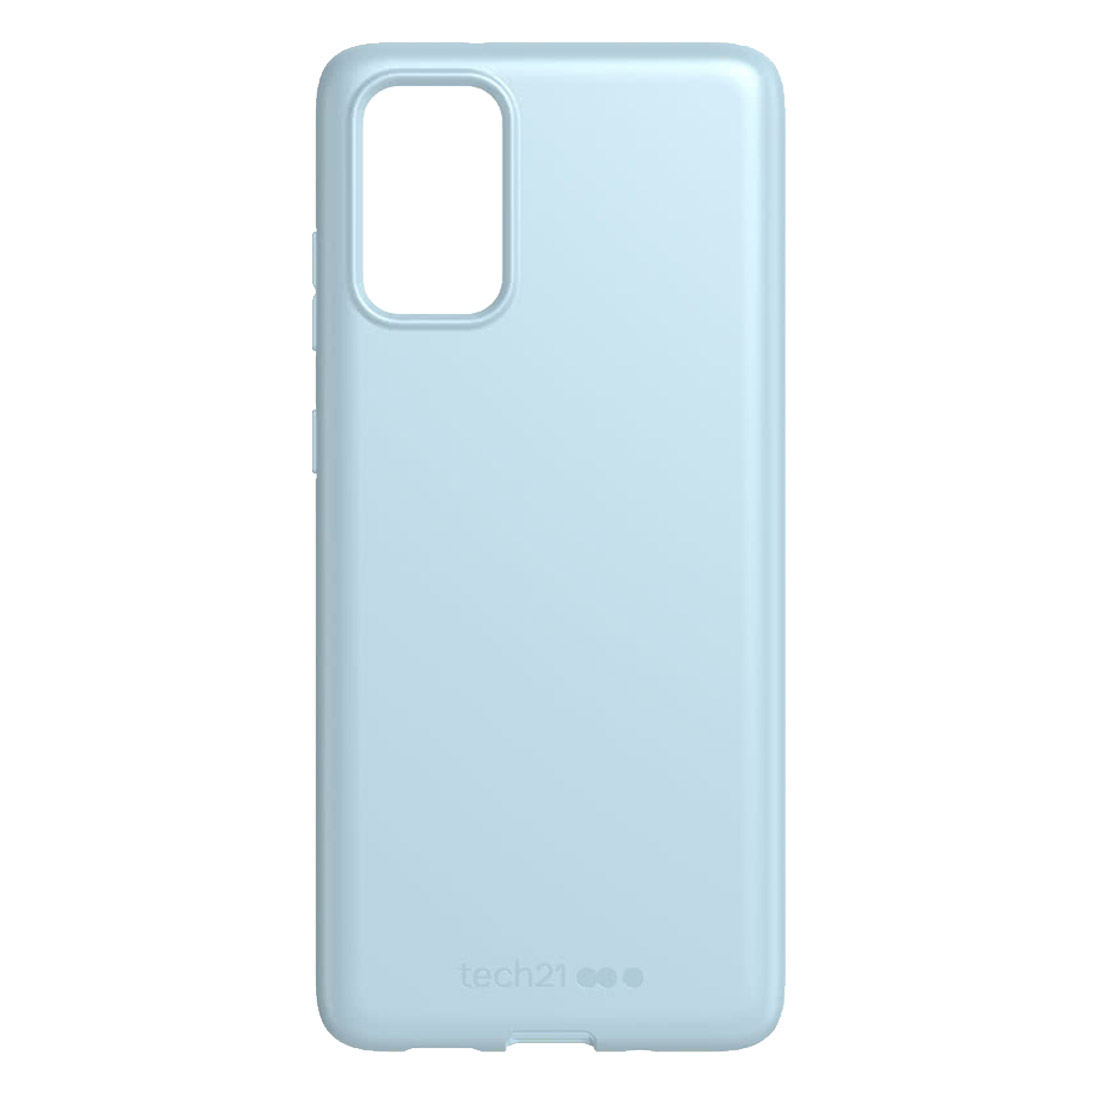 Tech21 Studio Colour Case for Samsung Galaxy S20+ Plus T21-7690 - Let Off Steam